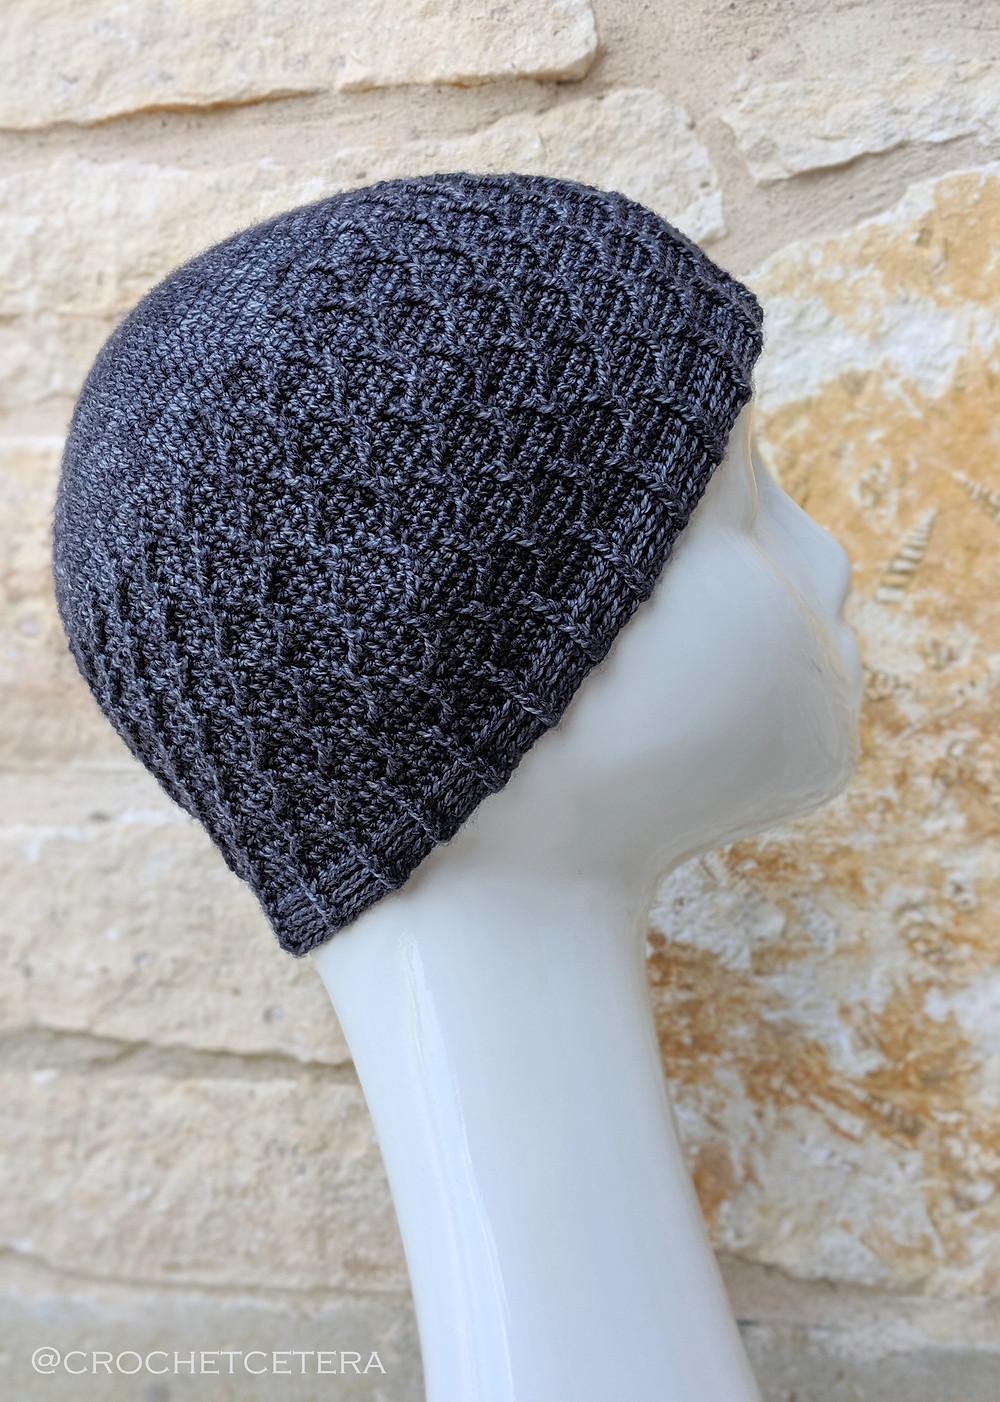 Bifurcation Beanie Crochet Pattern by Connie Lee Lynch of CrochEt Cetera by Connie Lee